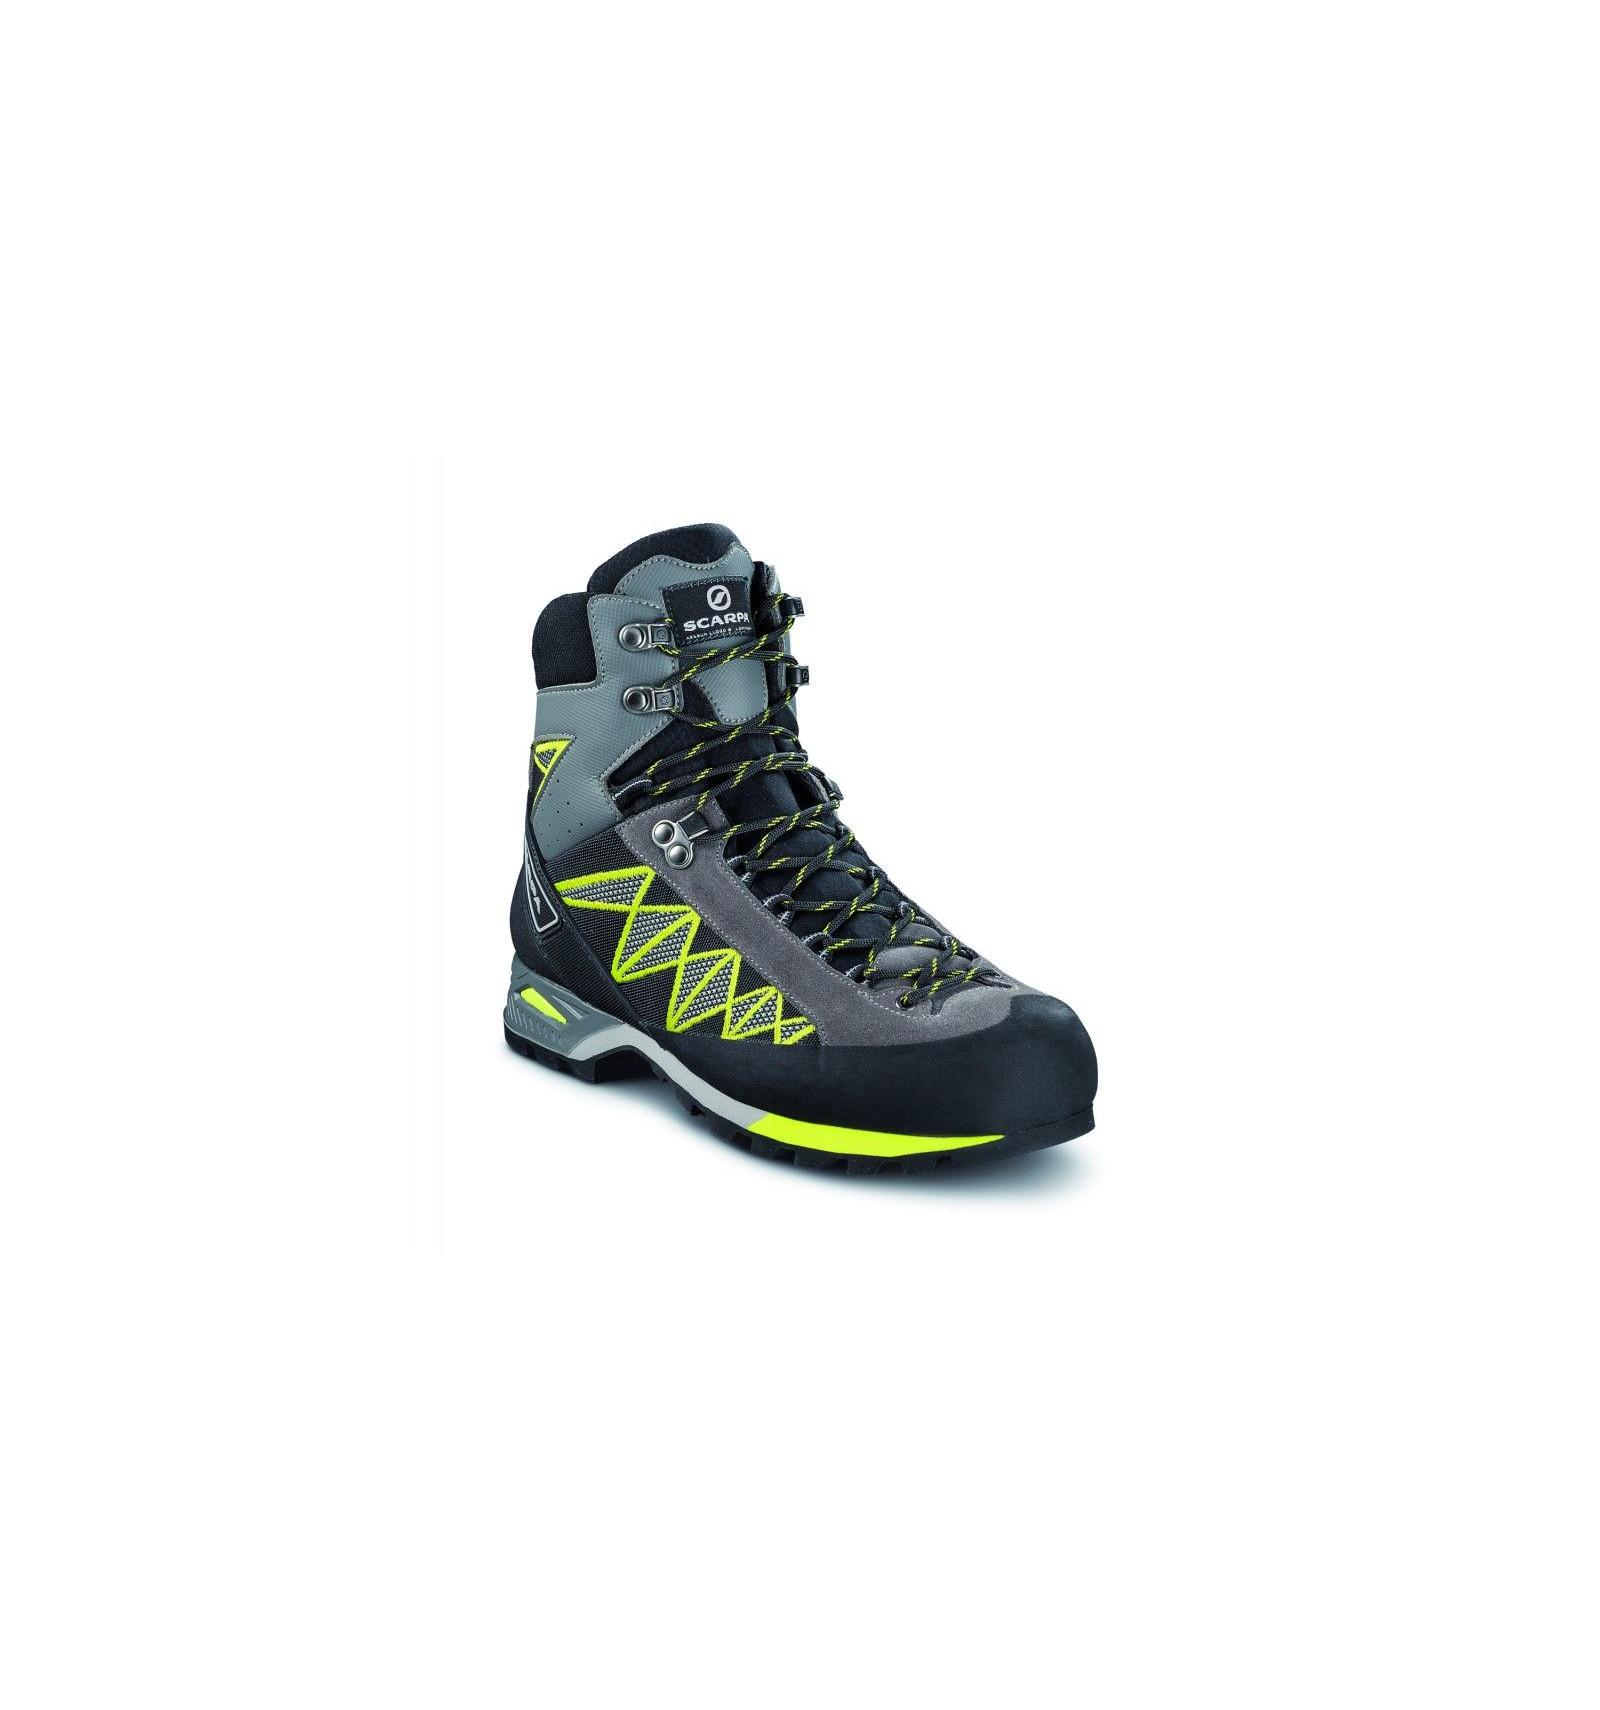 Scarpa Marmolada Trek OD Wmn Trekking Boots Grey//Blue